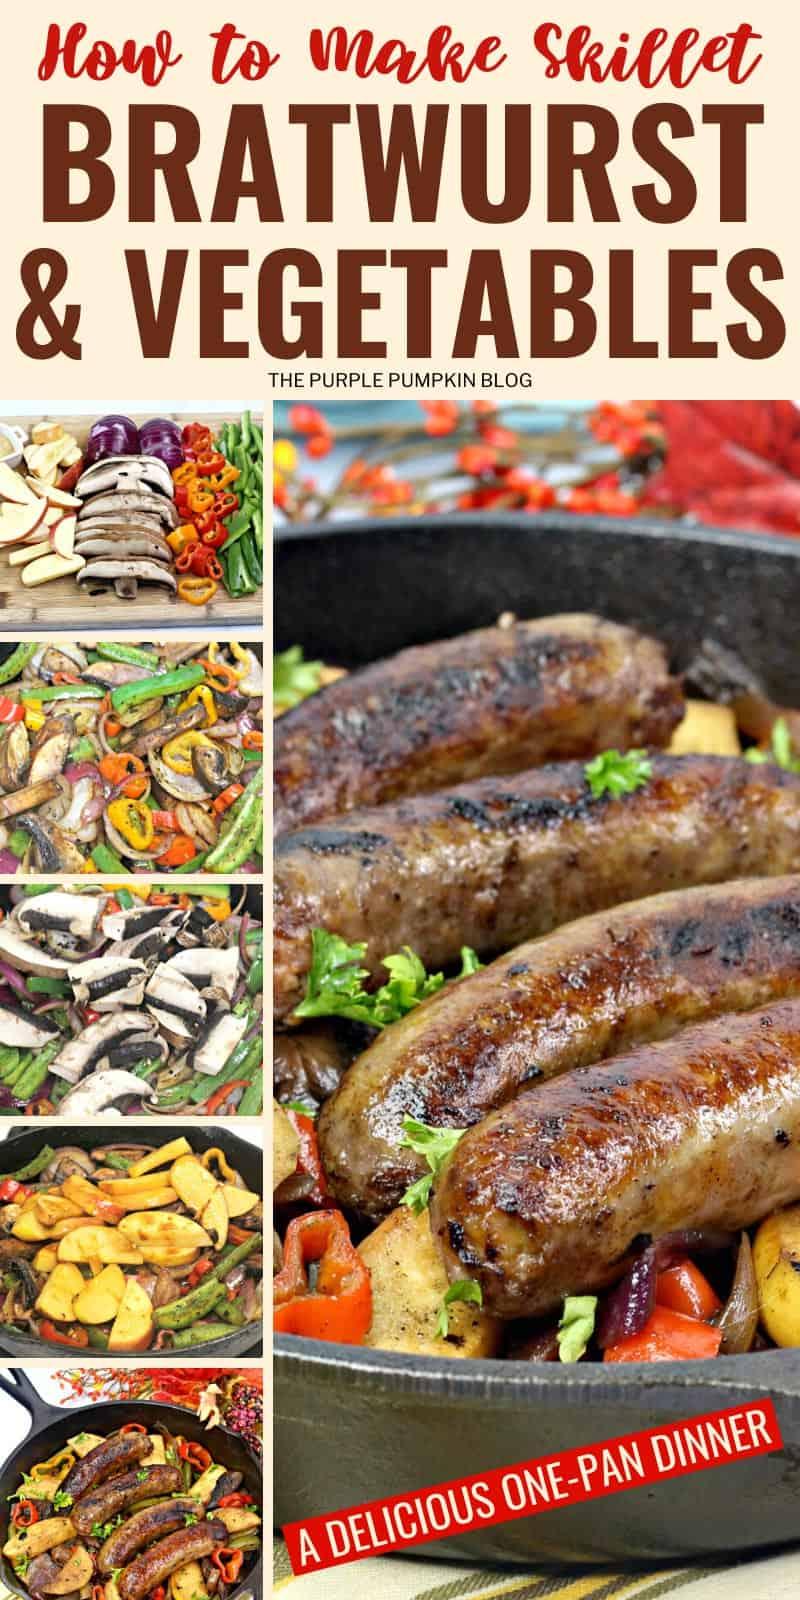 How to make skillet bratwurst and vegetables